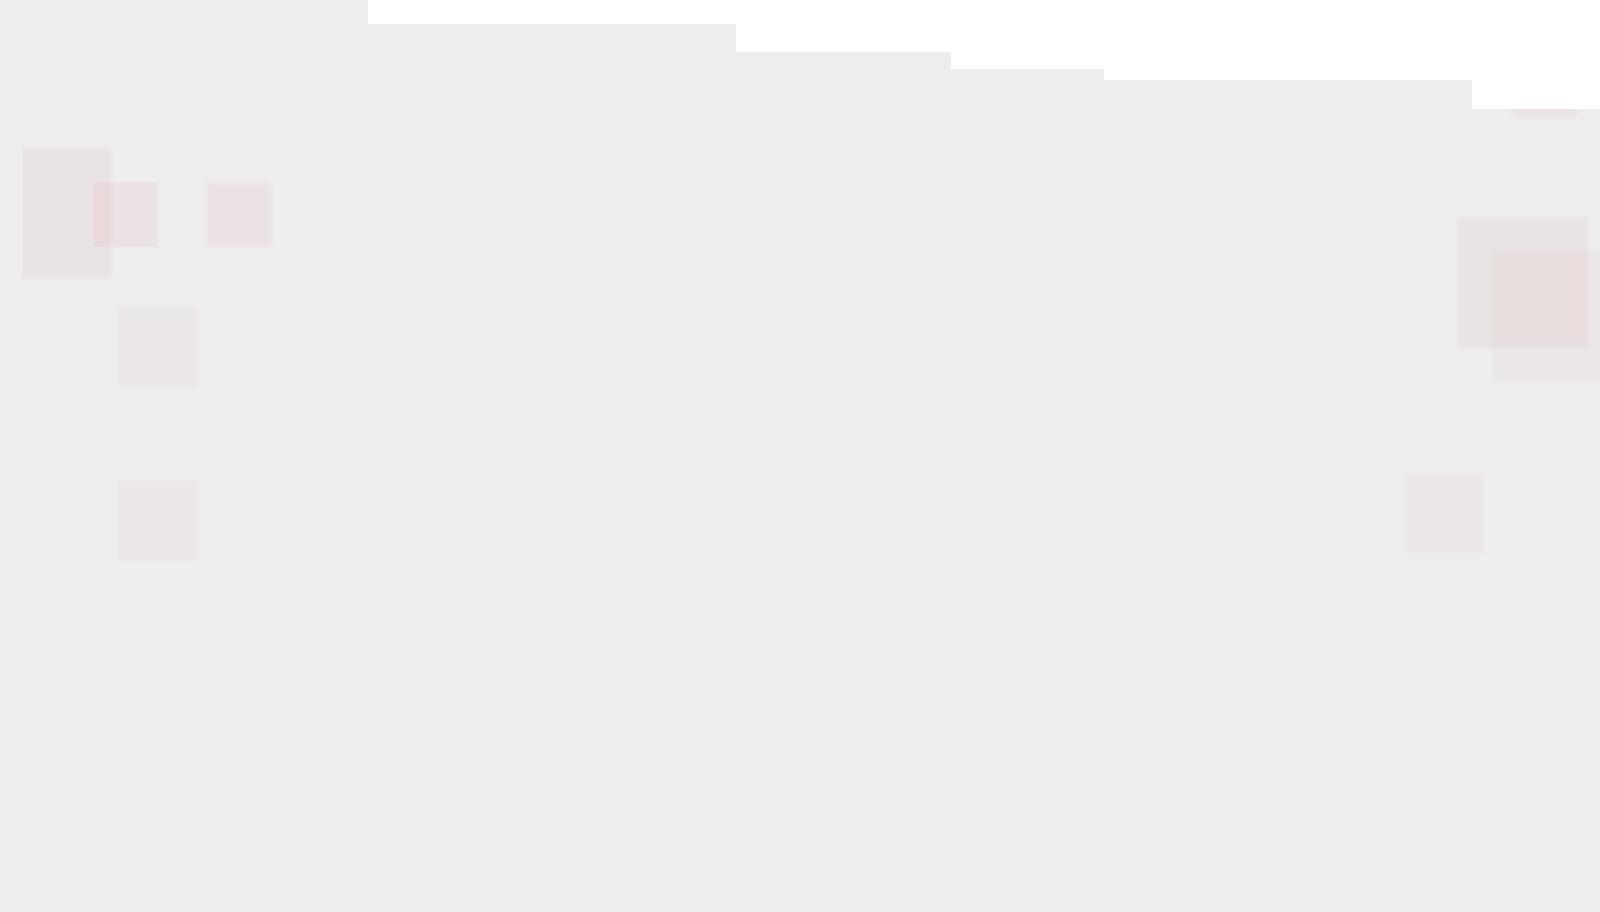 mid-banner4